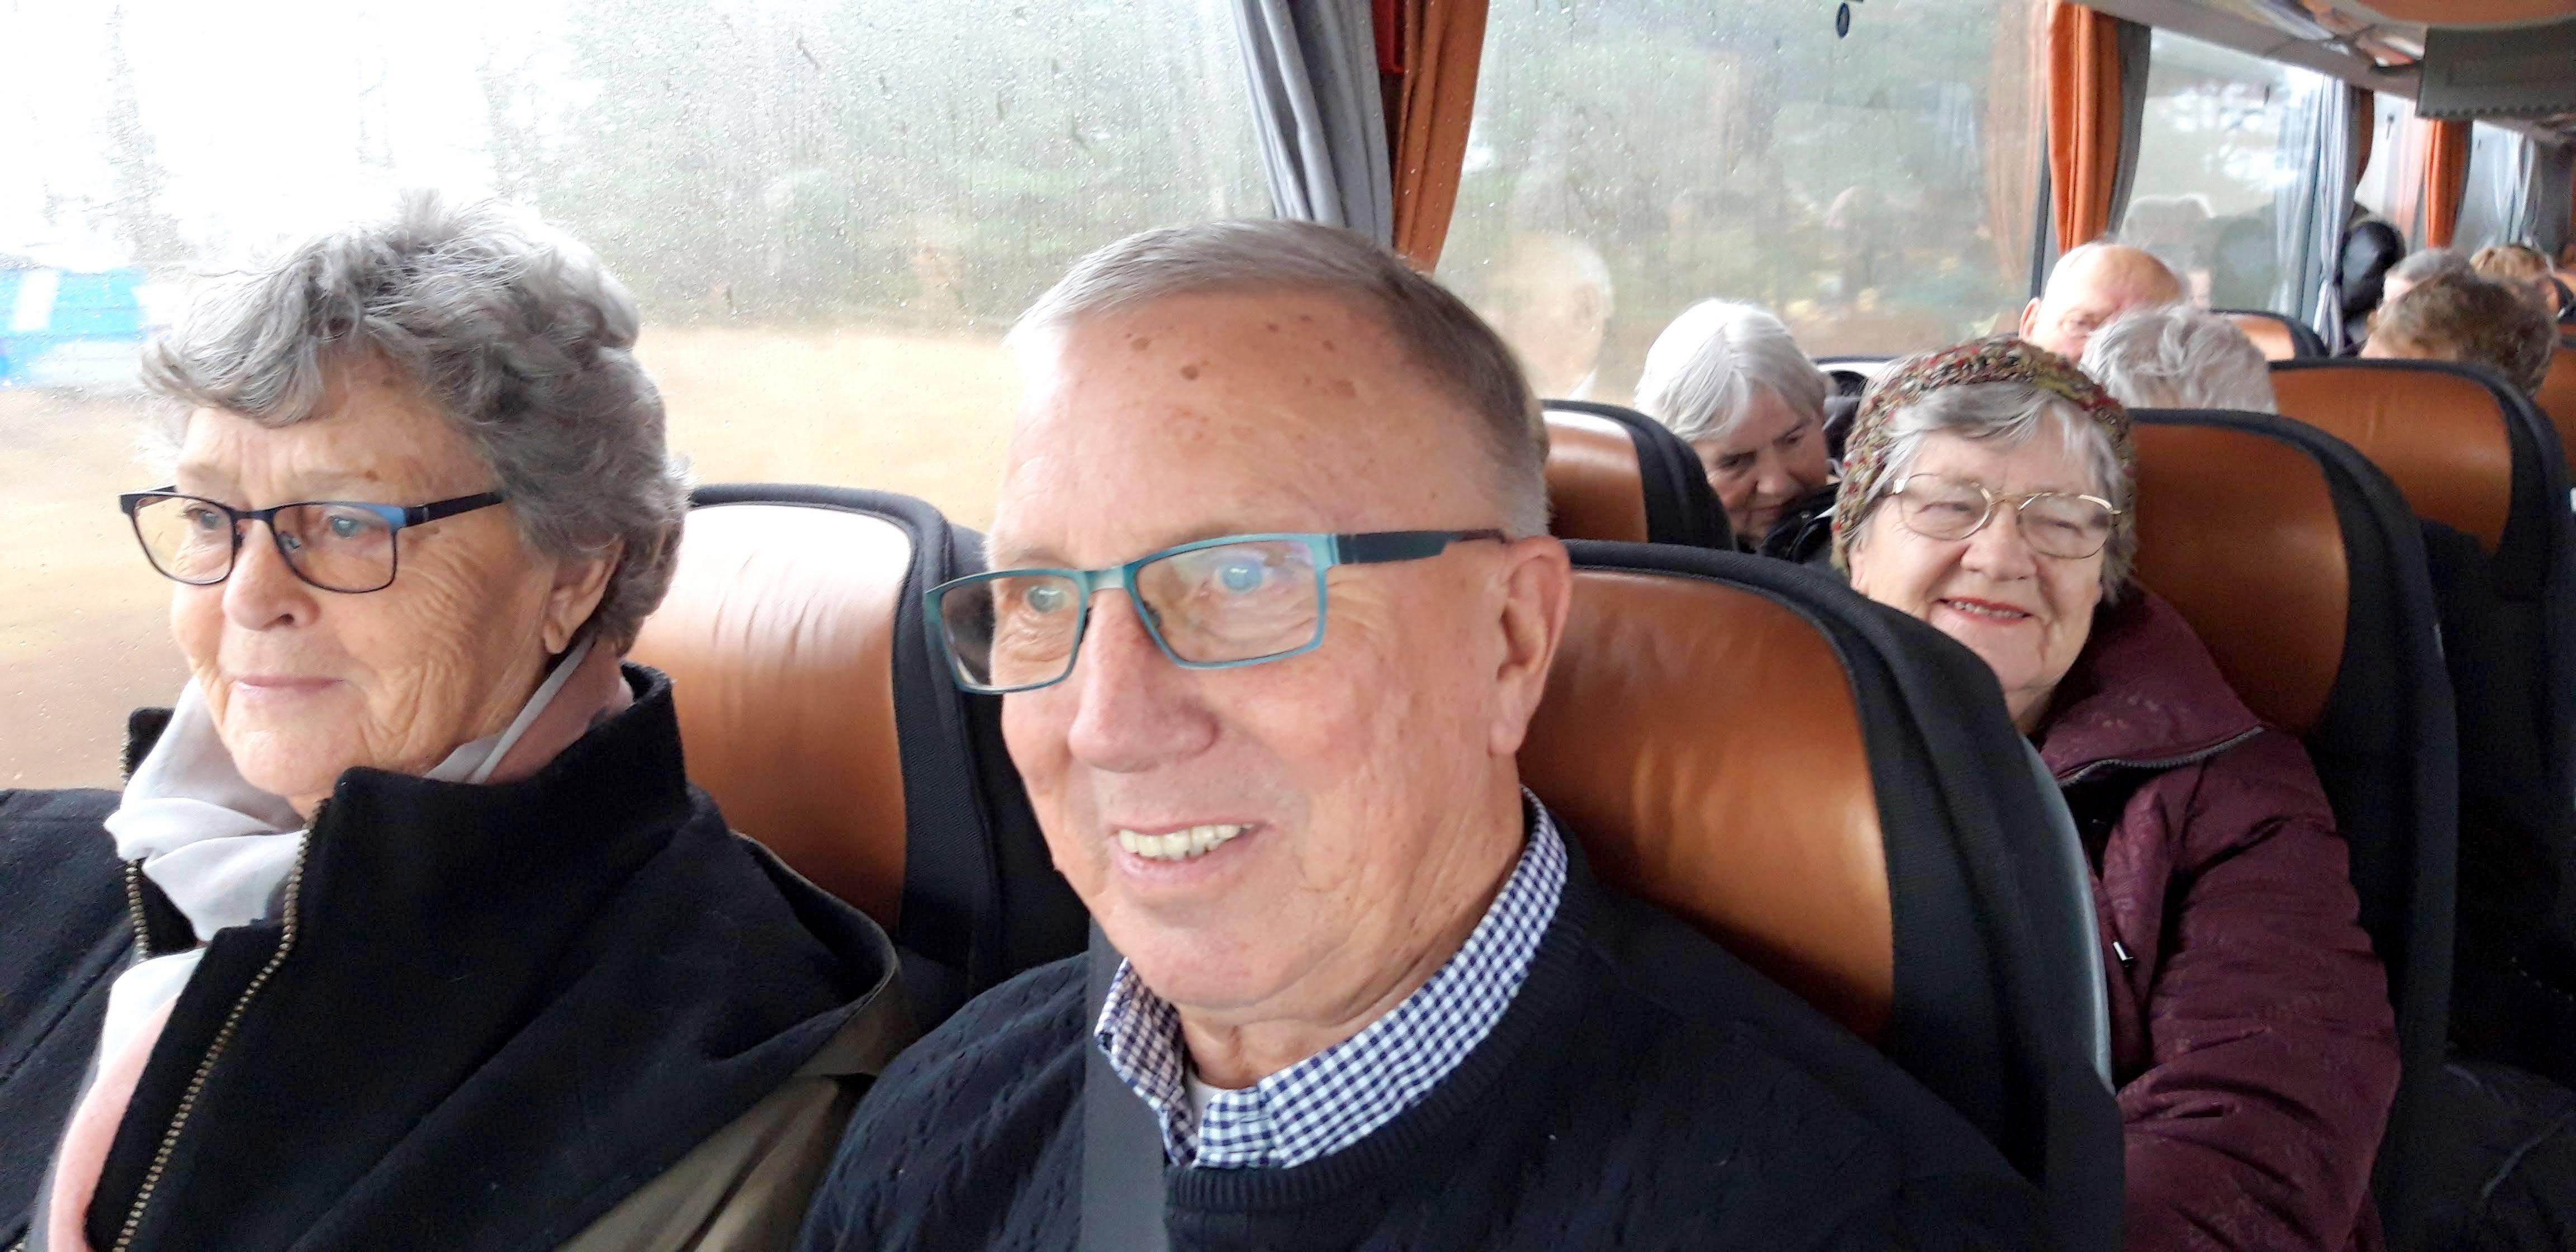 Glada resenärer